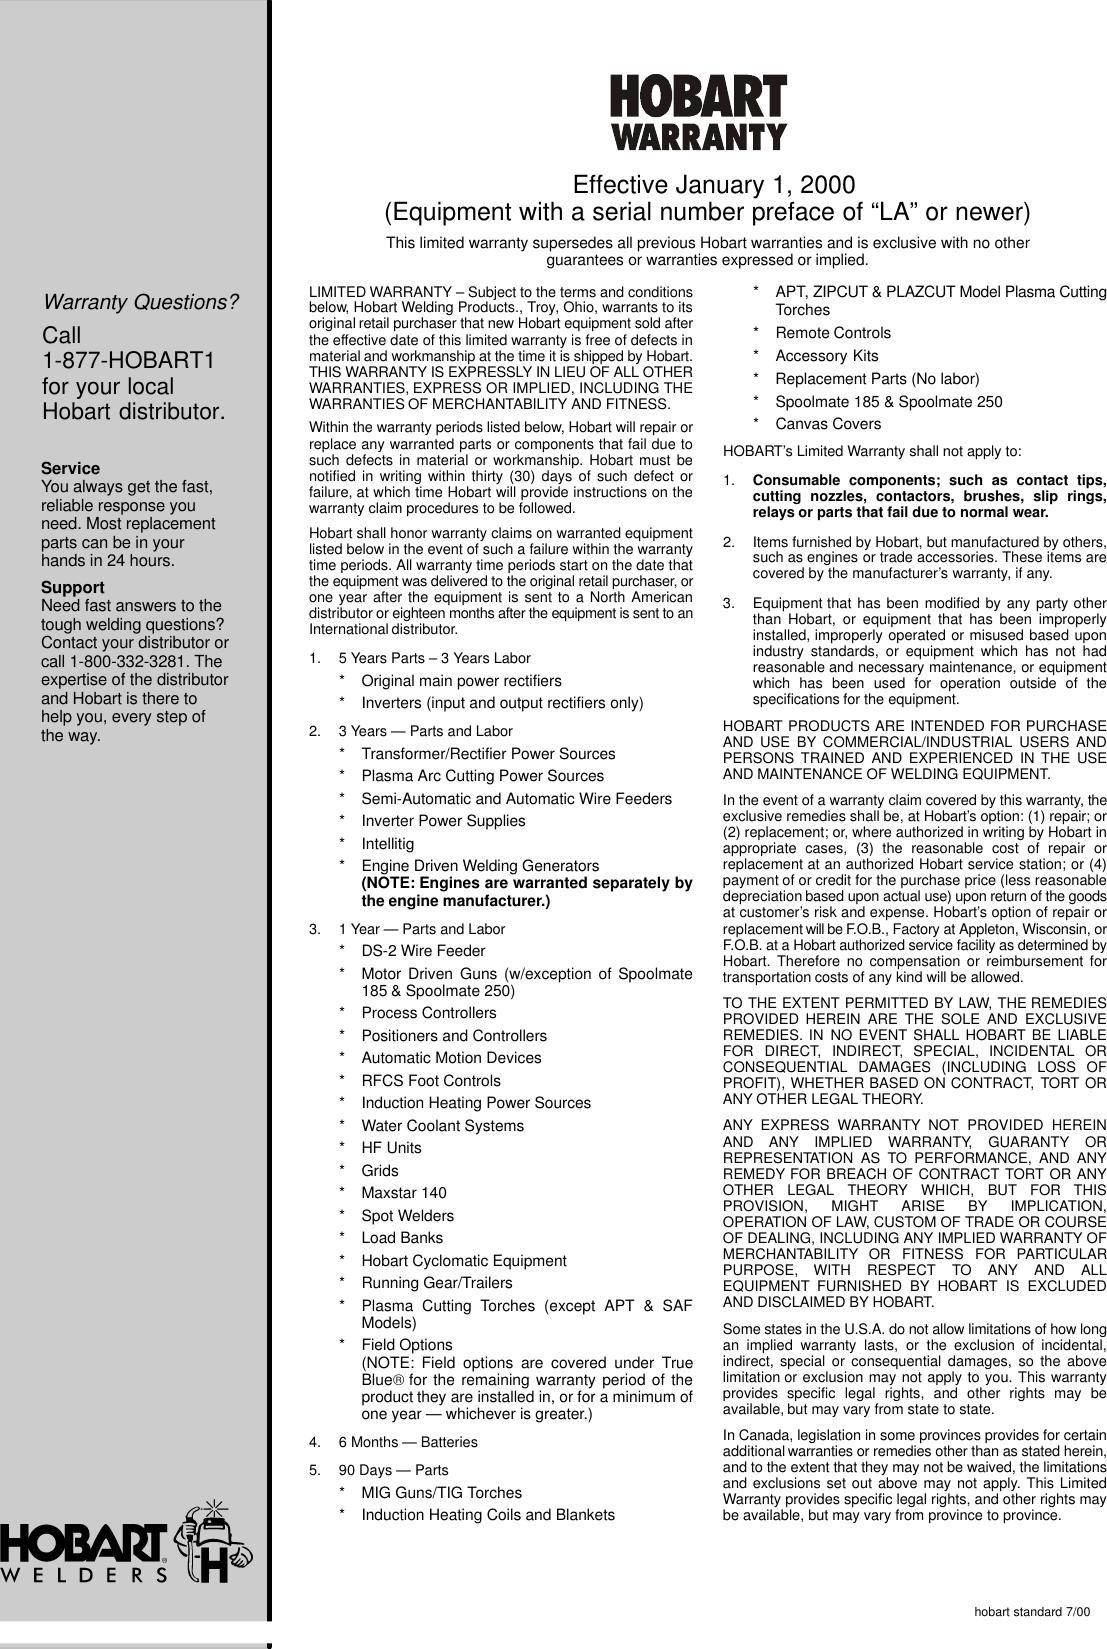 Hobart Handler 120 Owners Manual ManualsLib Makes It Easy To